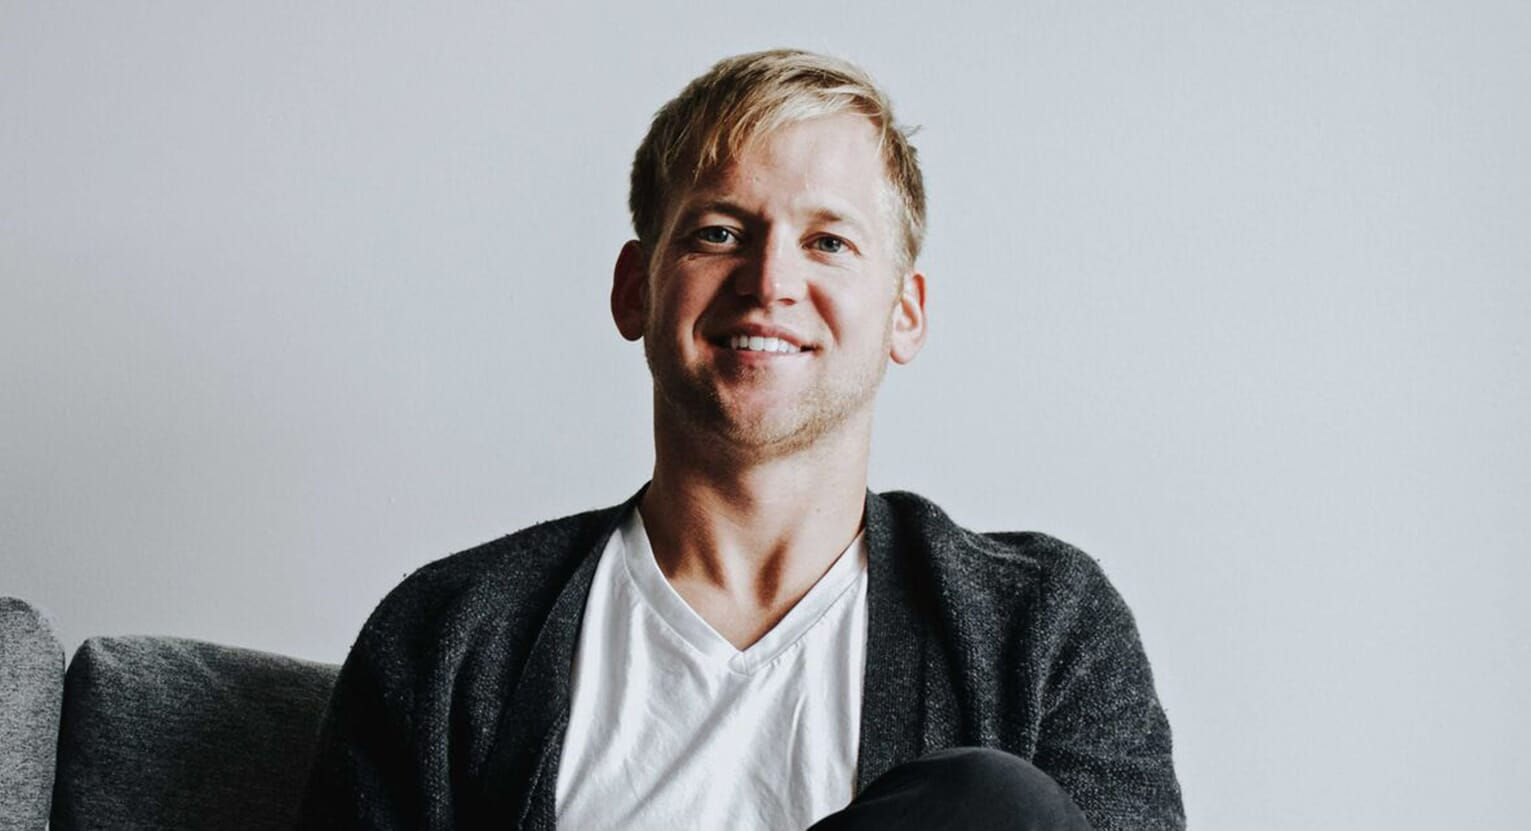 OPUMO Entrepreneurs: Scott Gabrielson, Founder of Oliver Cabell